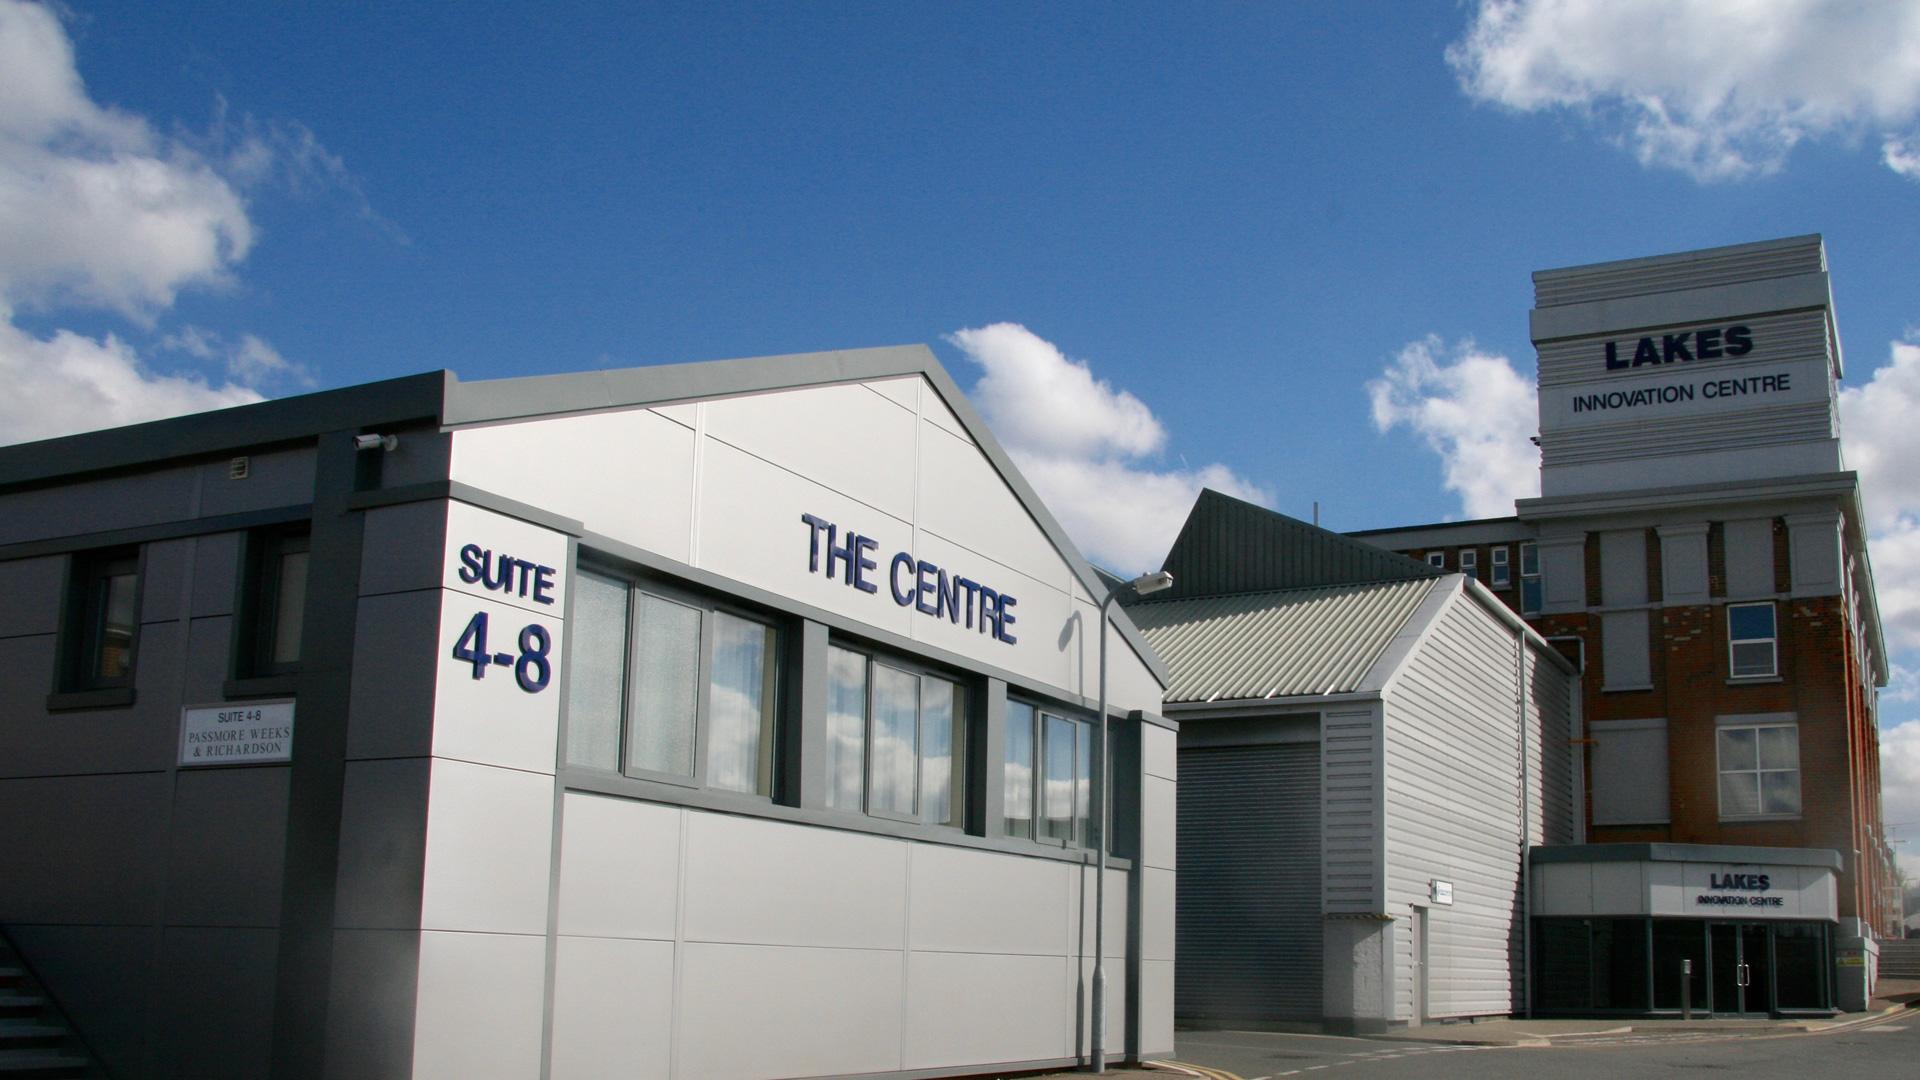 The Centre, Braintree